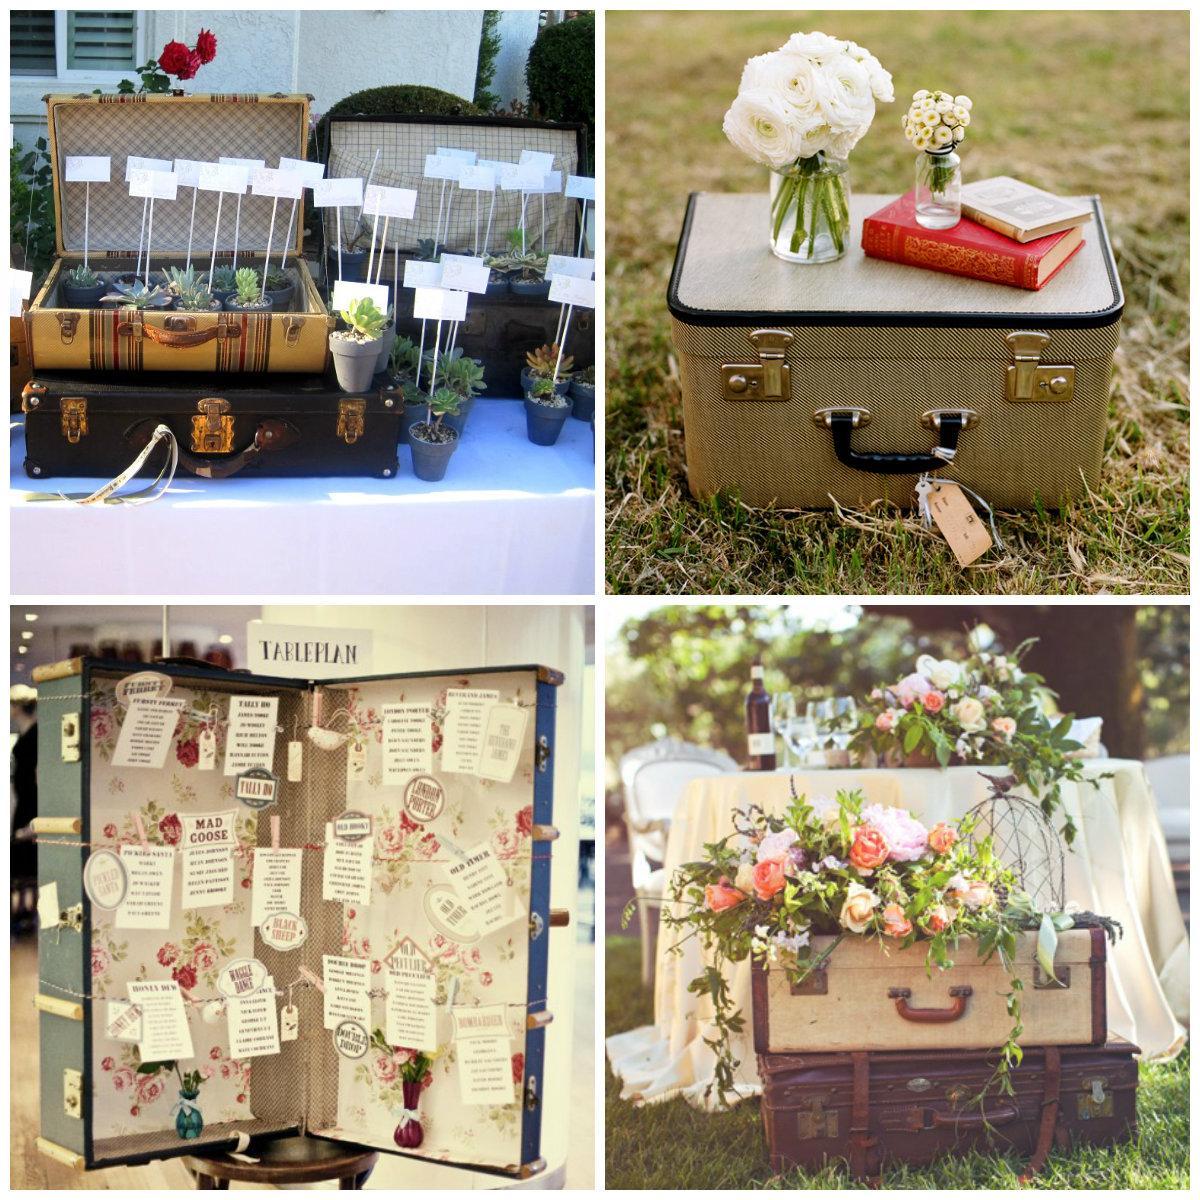 Jou jou maletas vintage para decorar una boda - Decorar tu boda ...